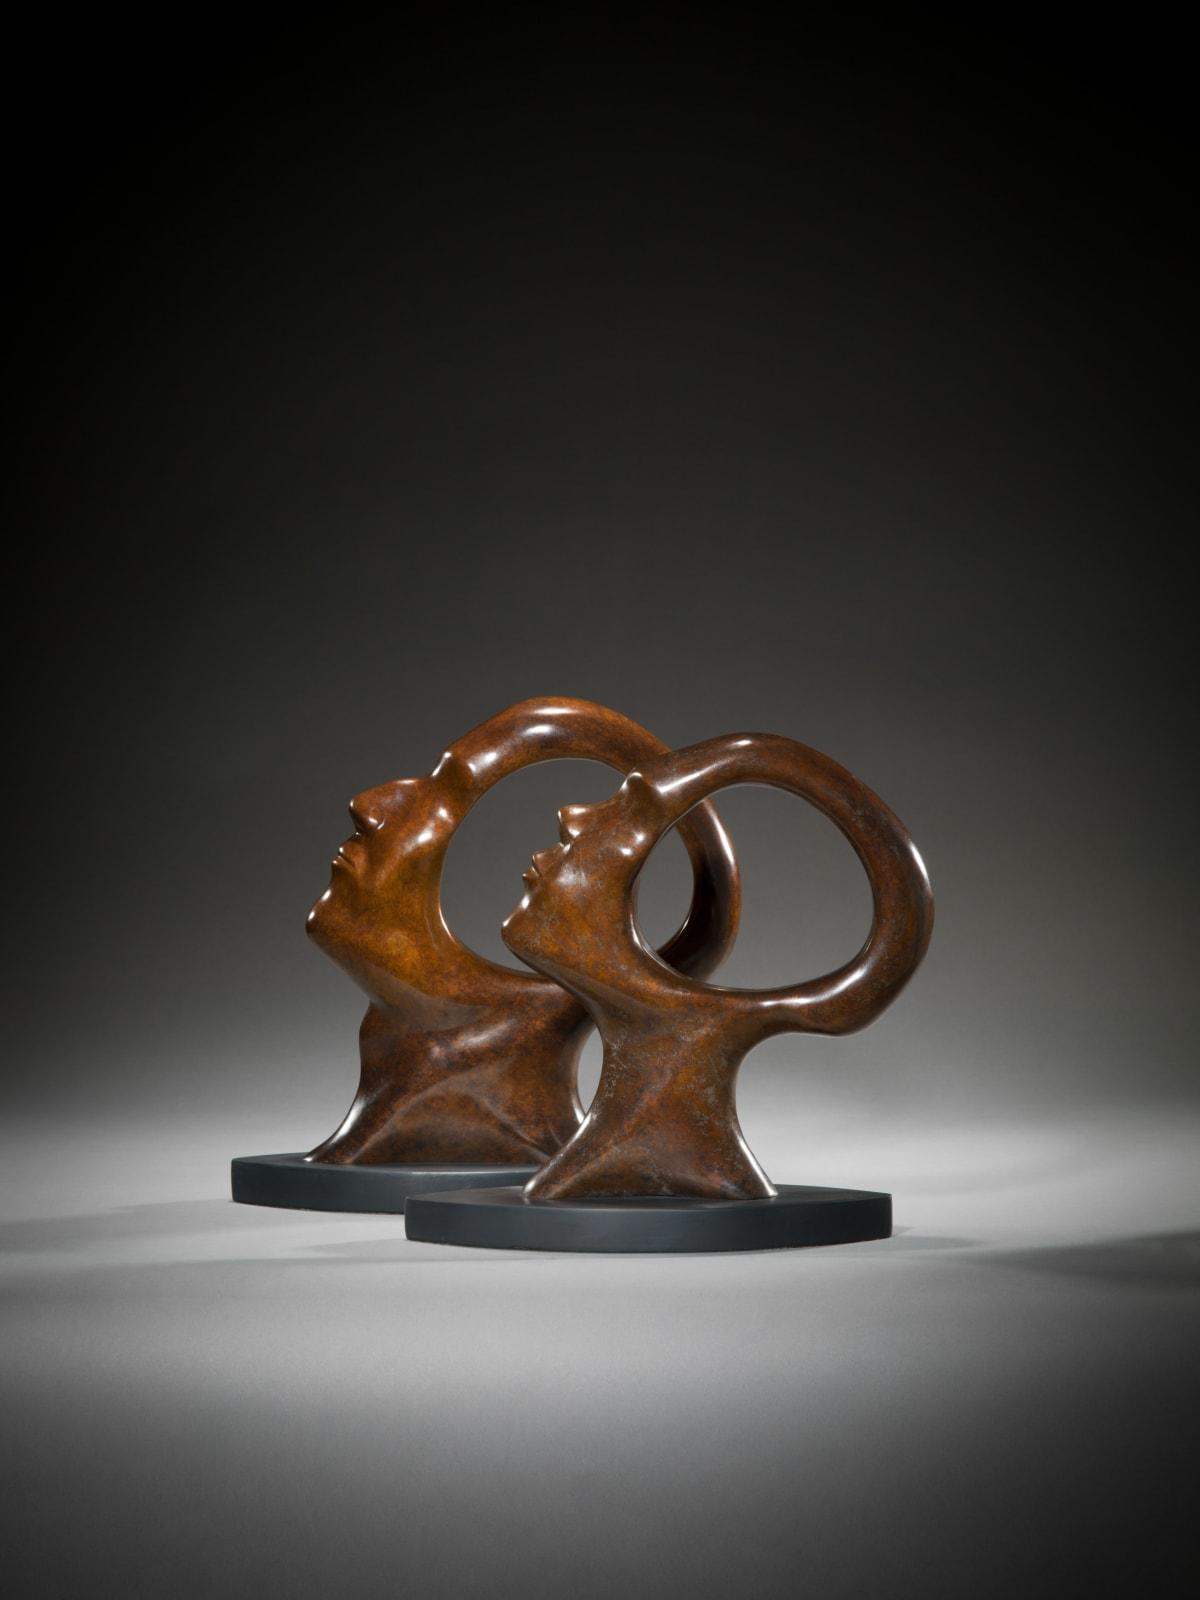 Simon Gudgeon Search for Enlightenment, 2018 Bronze Sculpture 33 x 27 x 6 cm 13 x 10 5/8 x 2 3/8 in 13 of 150